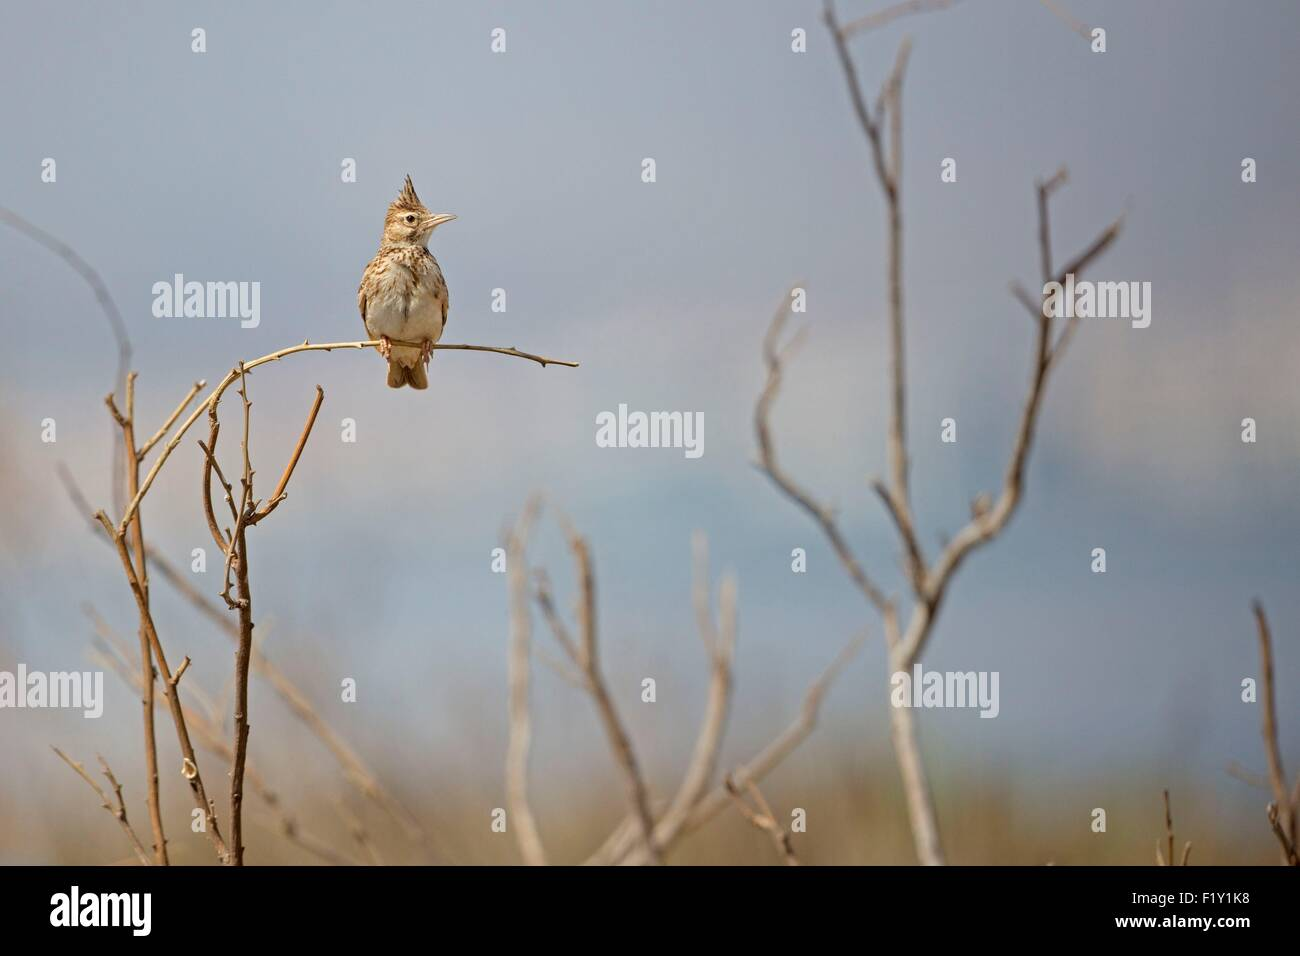 La lagune de Nador, Maroc, Crested lark (Galerida cristata) Photo Stock